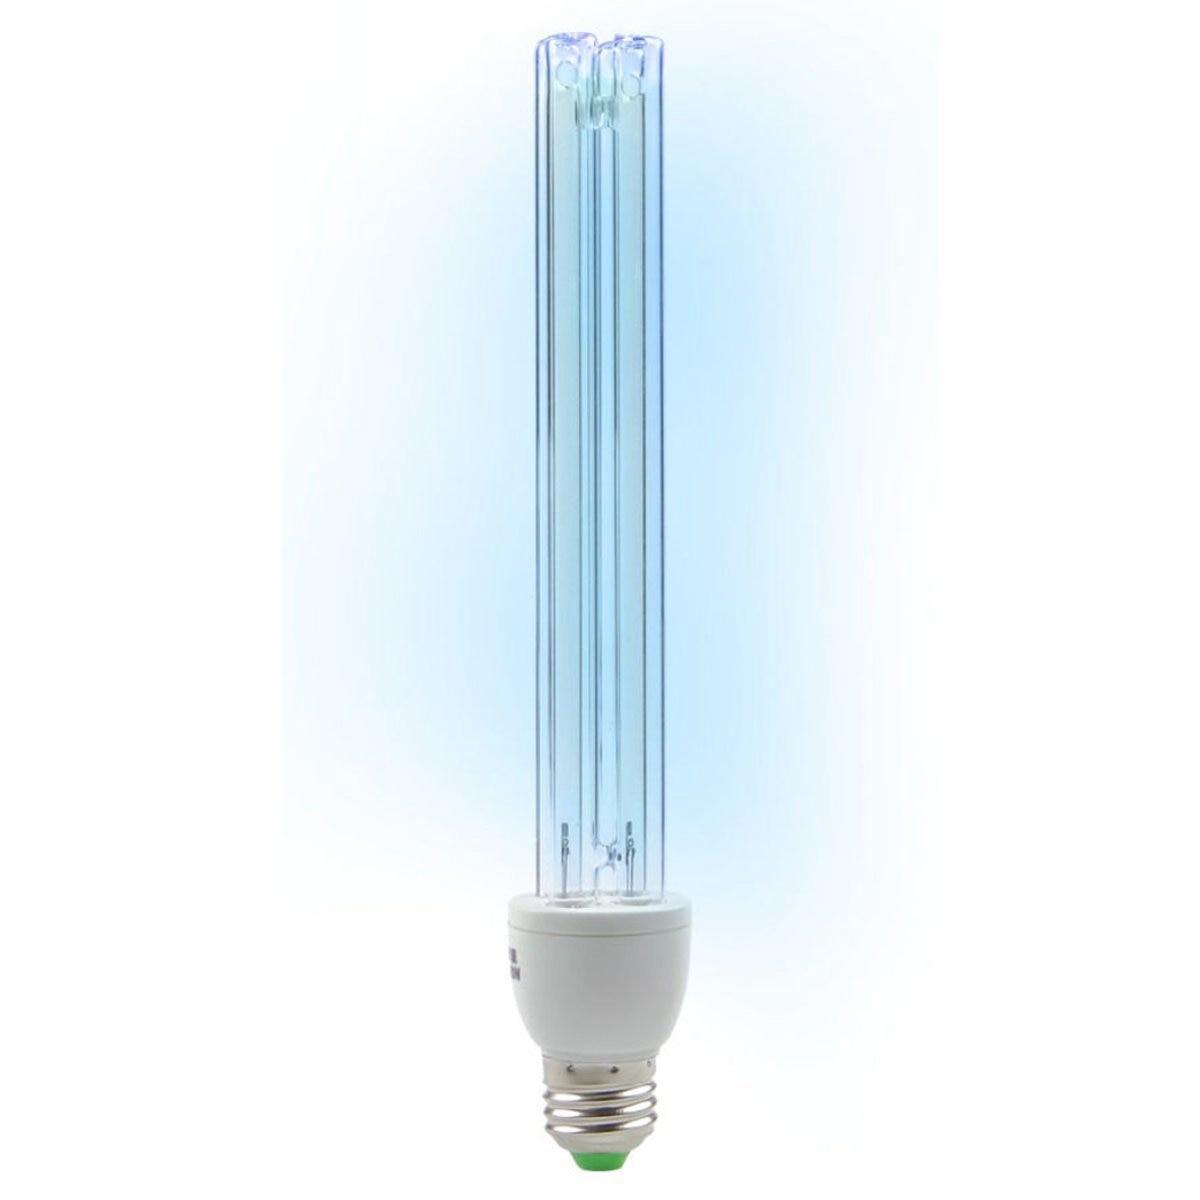 E27 UVC Uv Light Tube 20 Watt AC220V Desinfektion Lampe Ozon ...